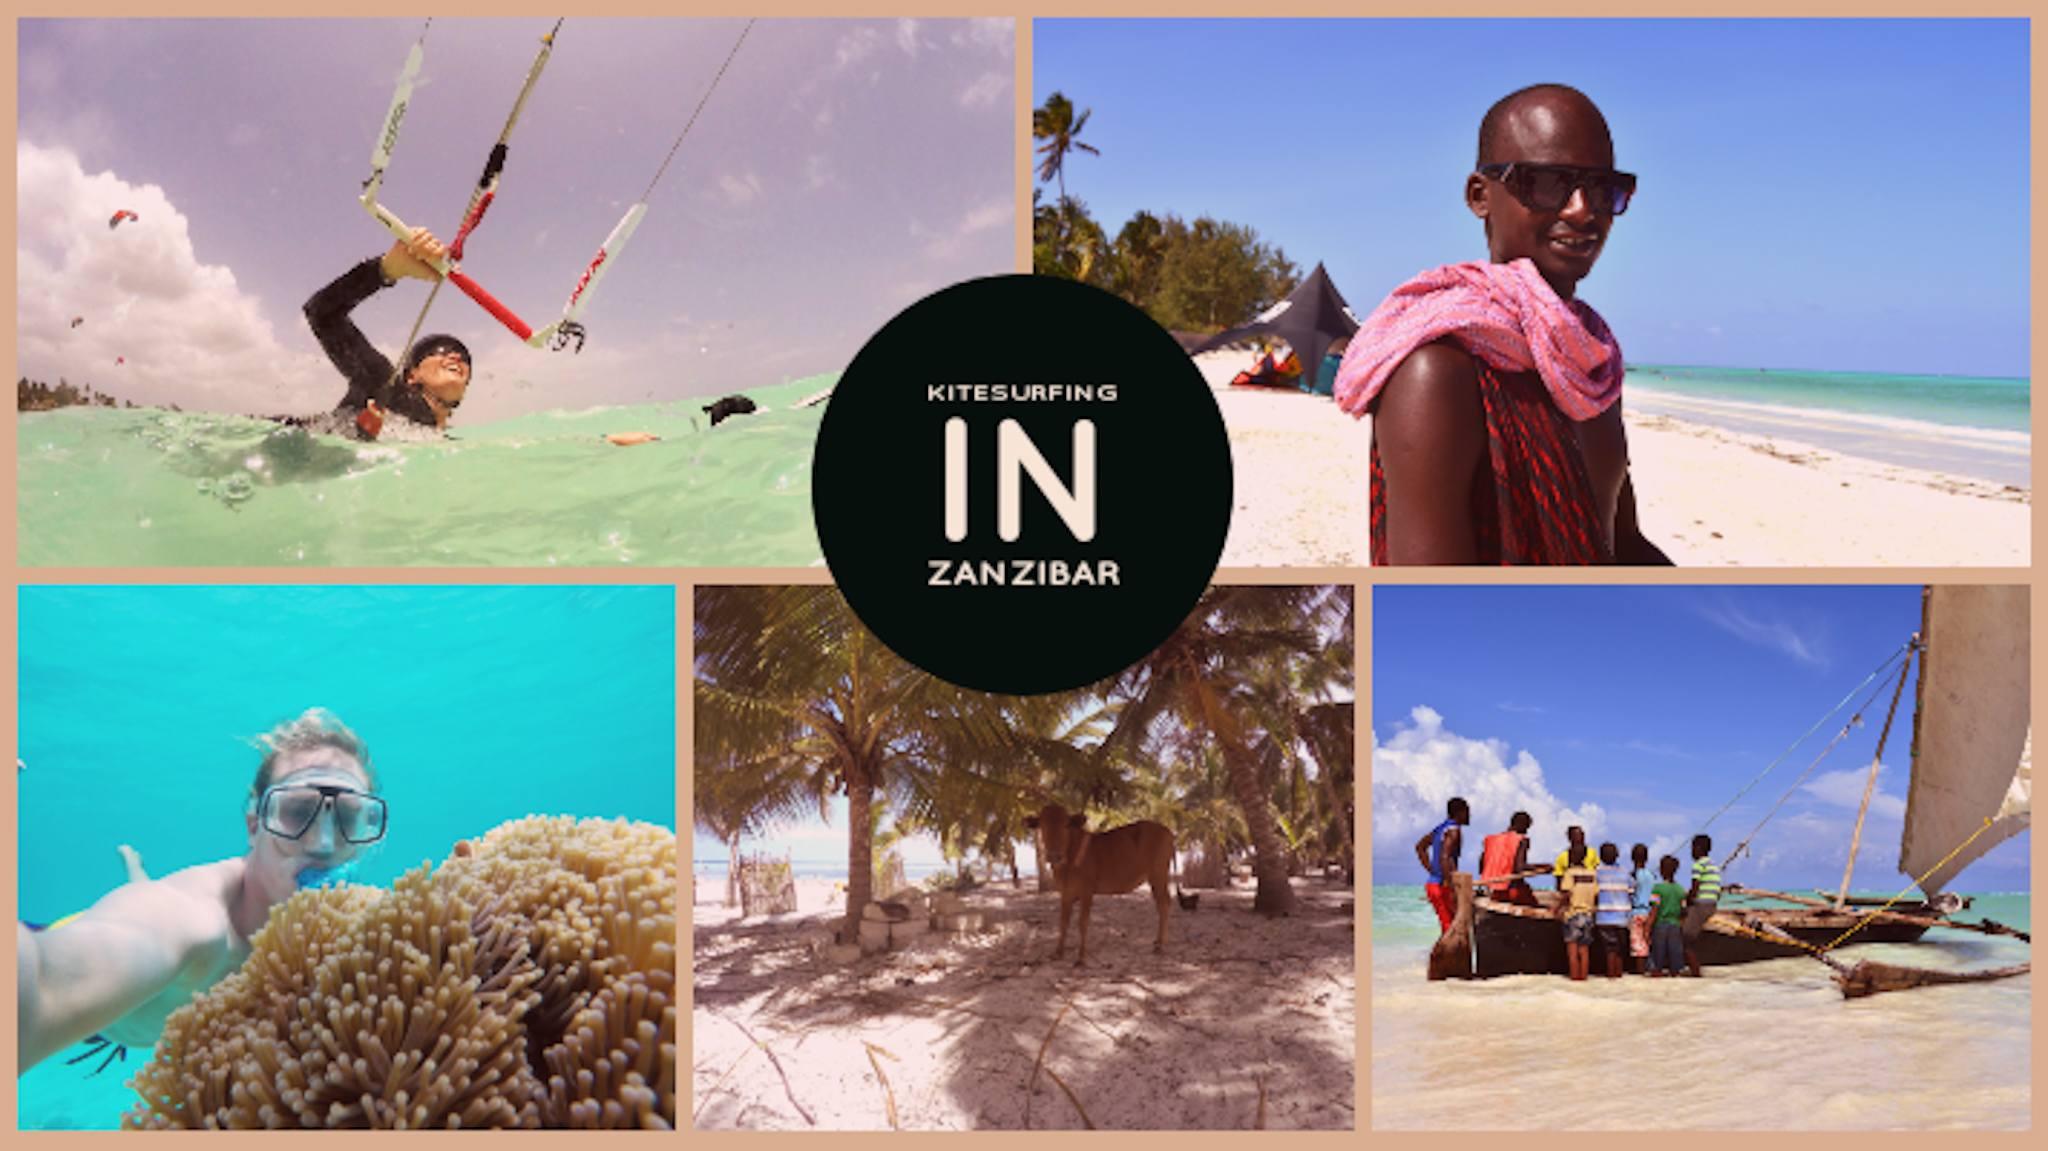 Top Kitesurf Destination For 2020 - Zanzibar